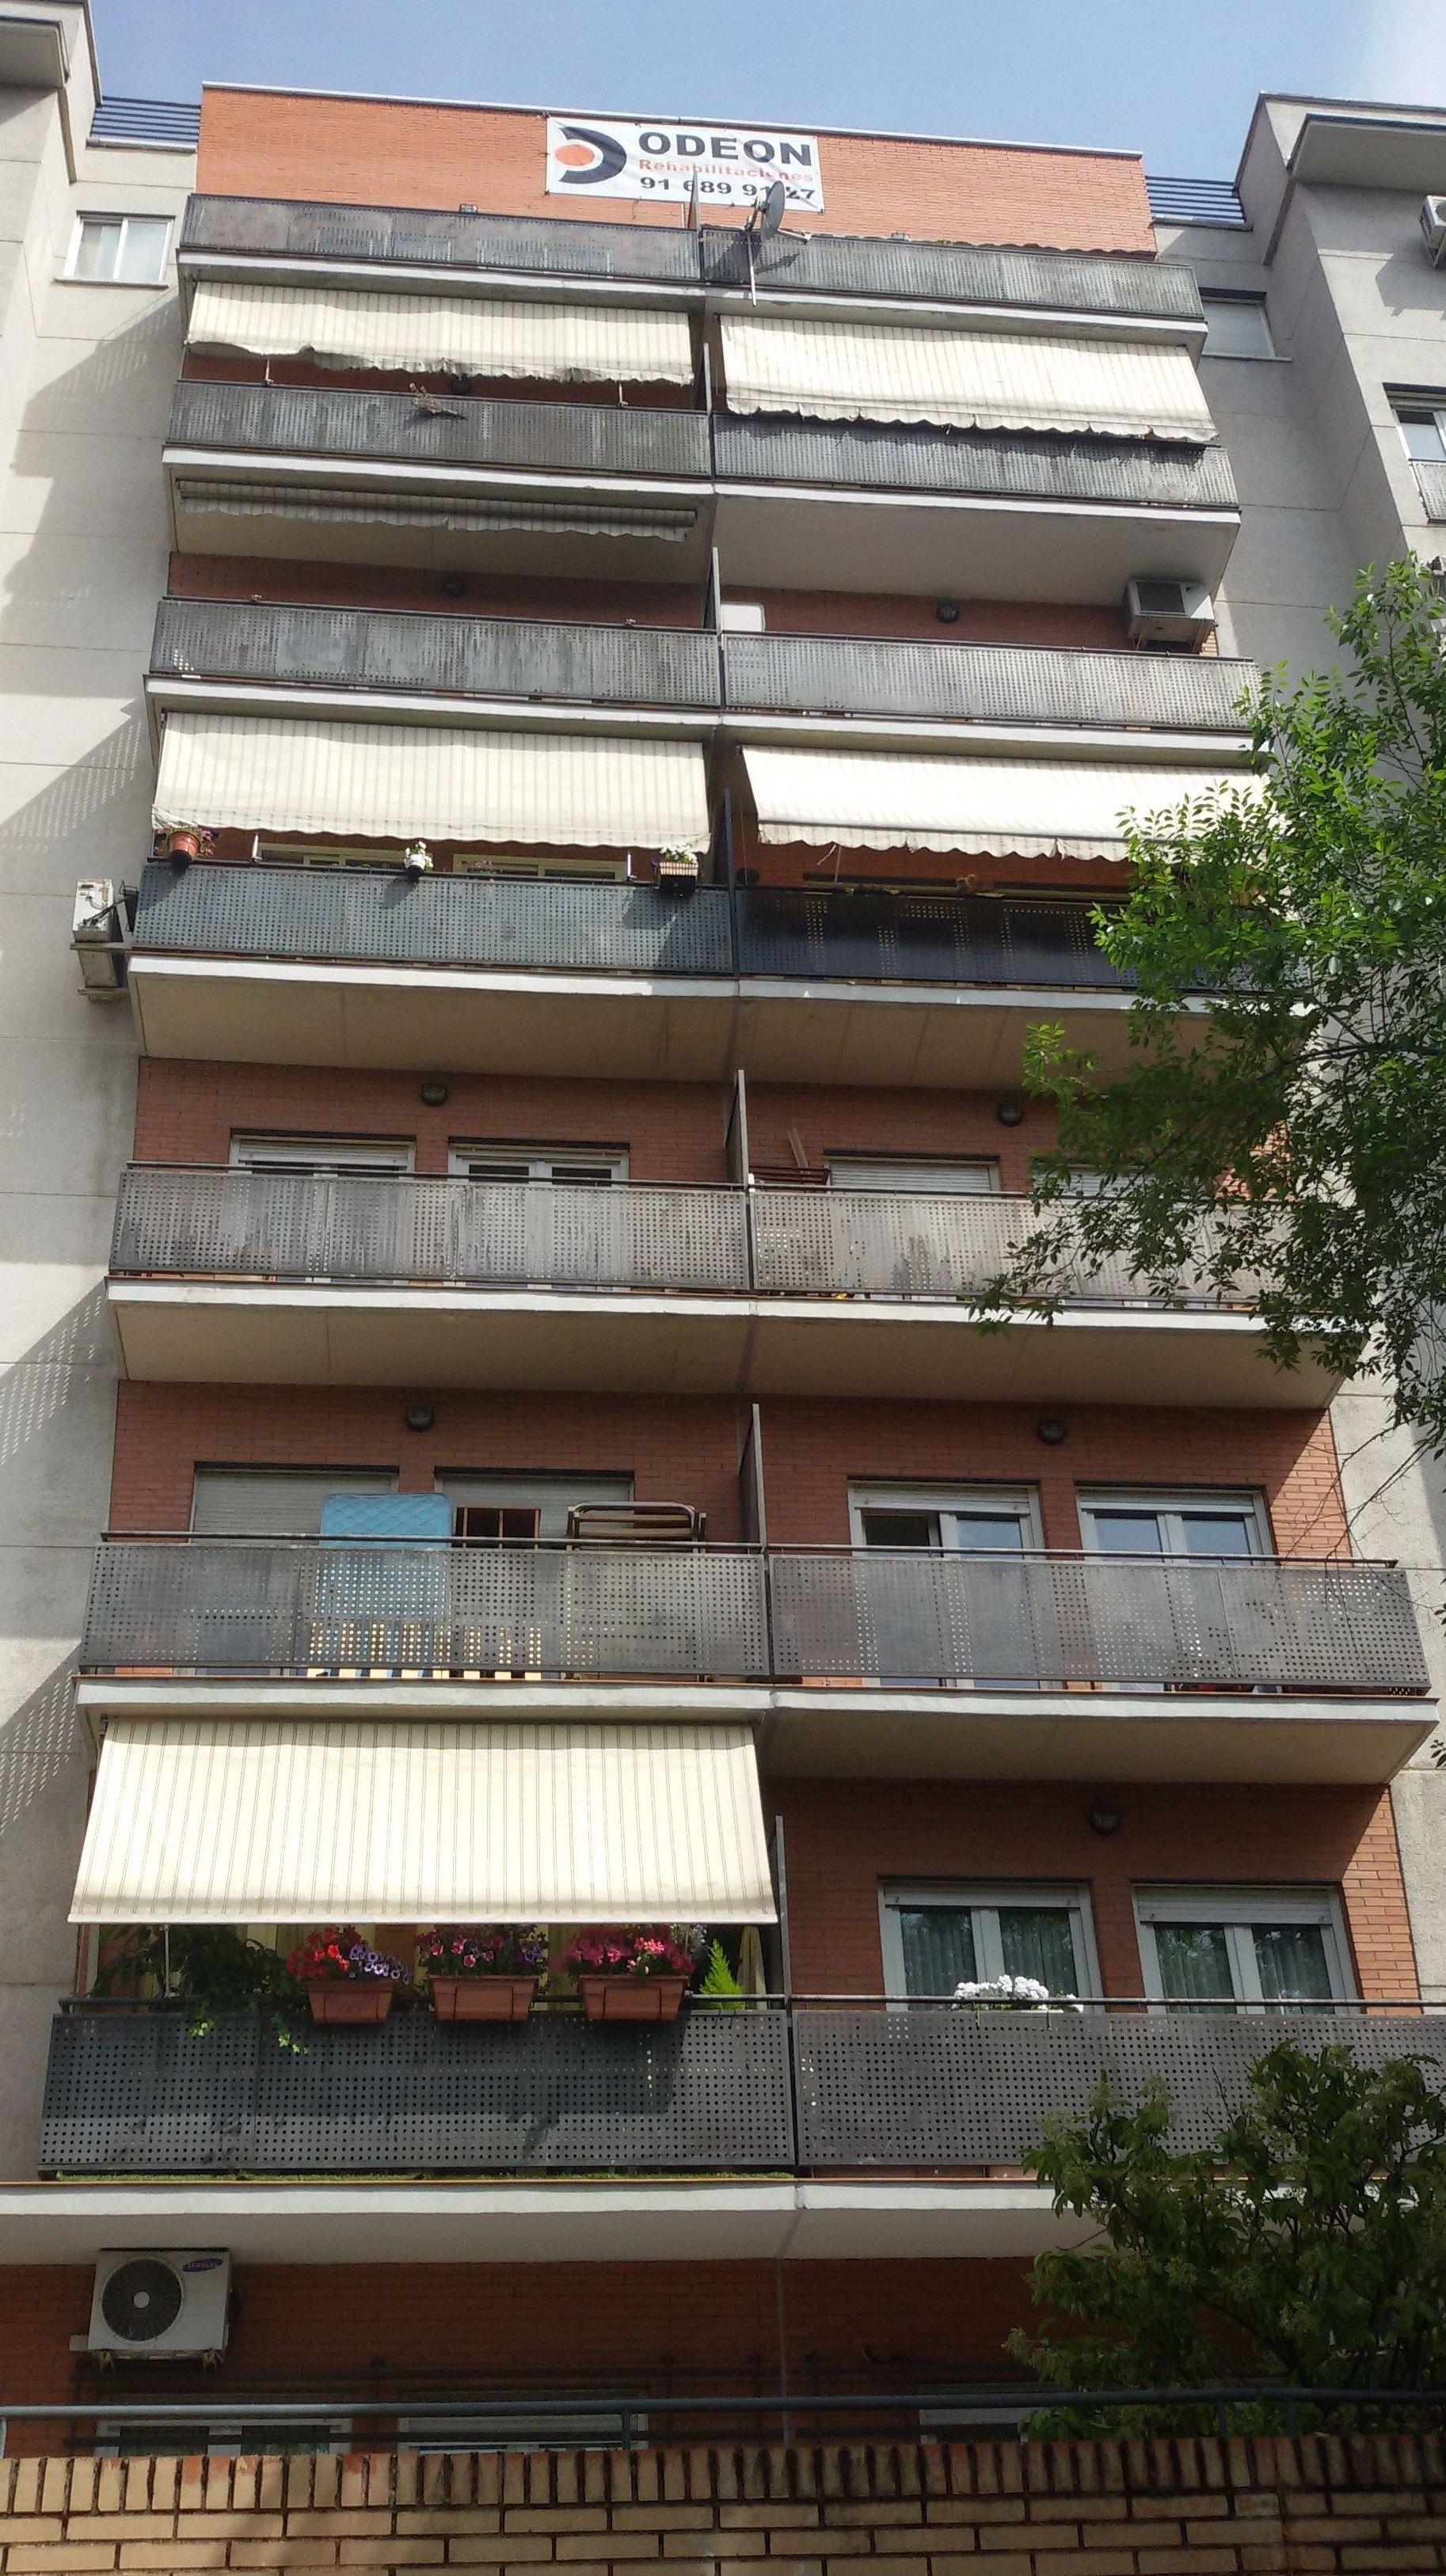 Rehabilitación de fachadas. Estado reformado